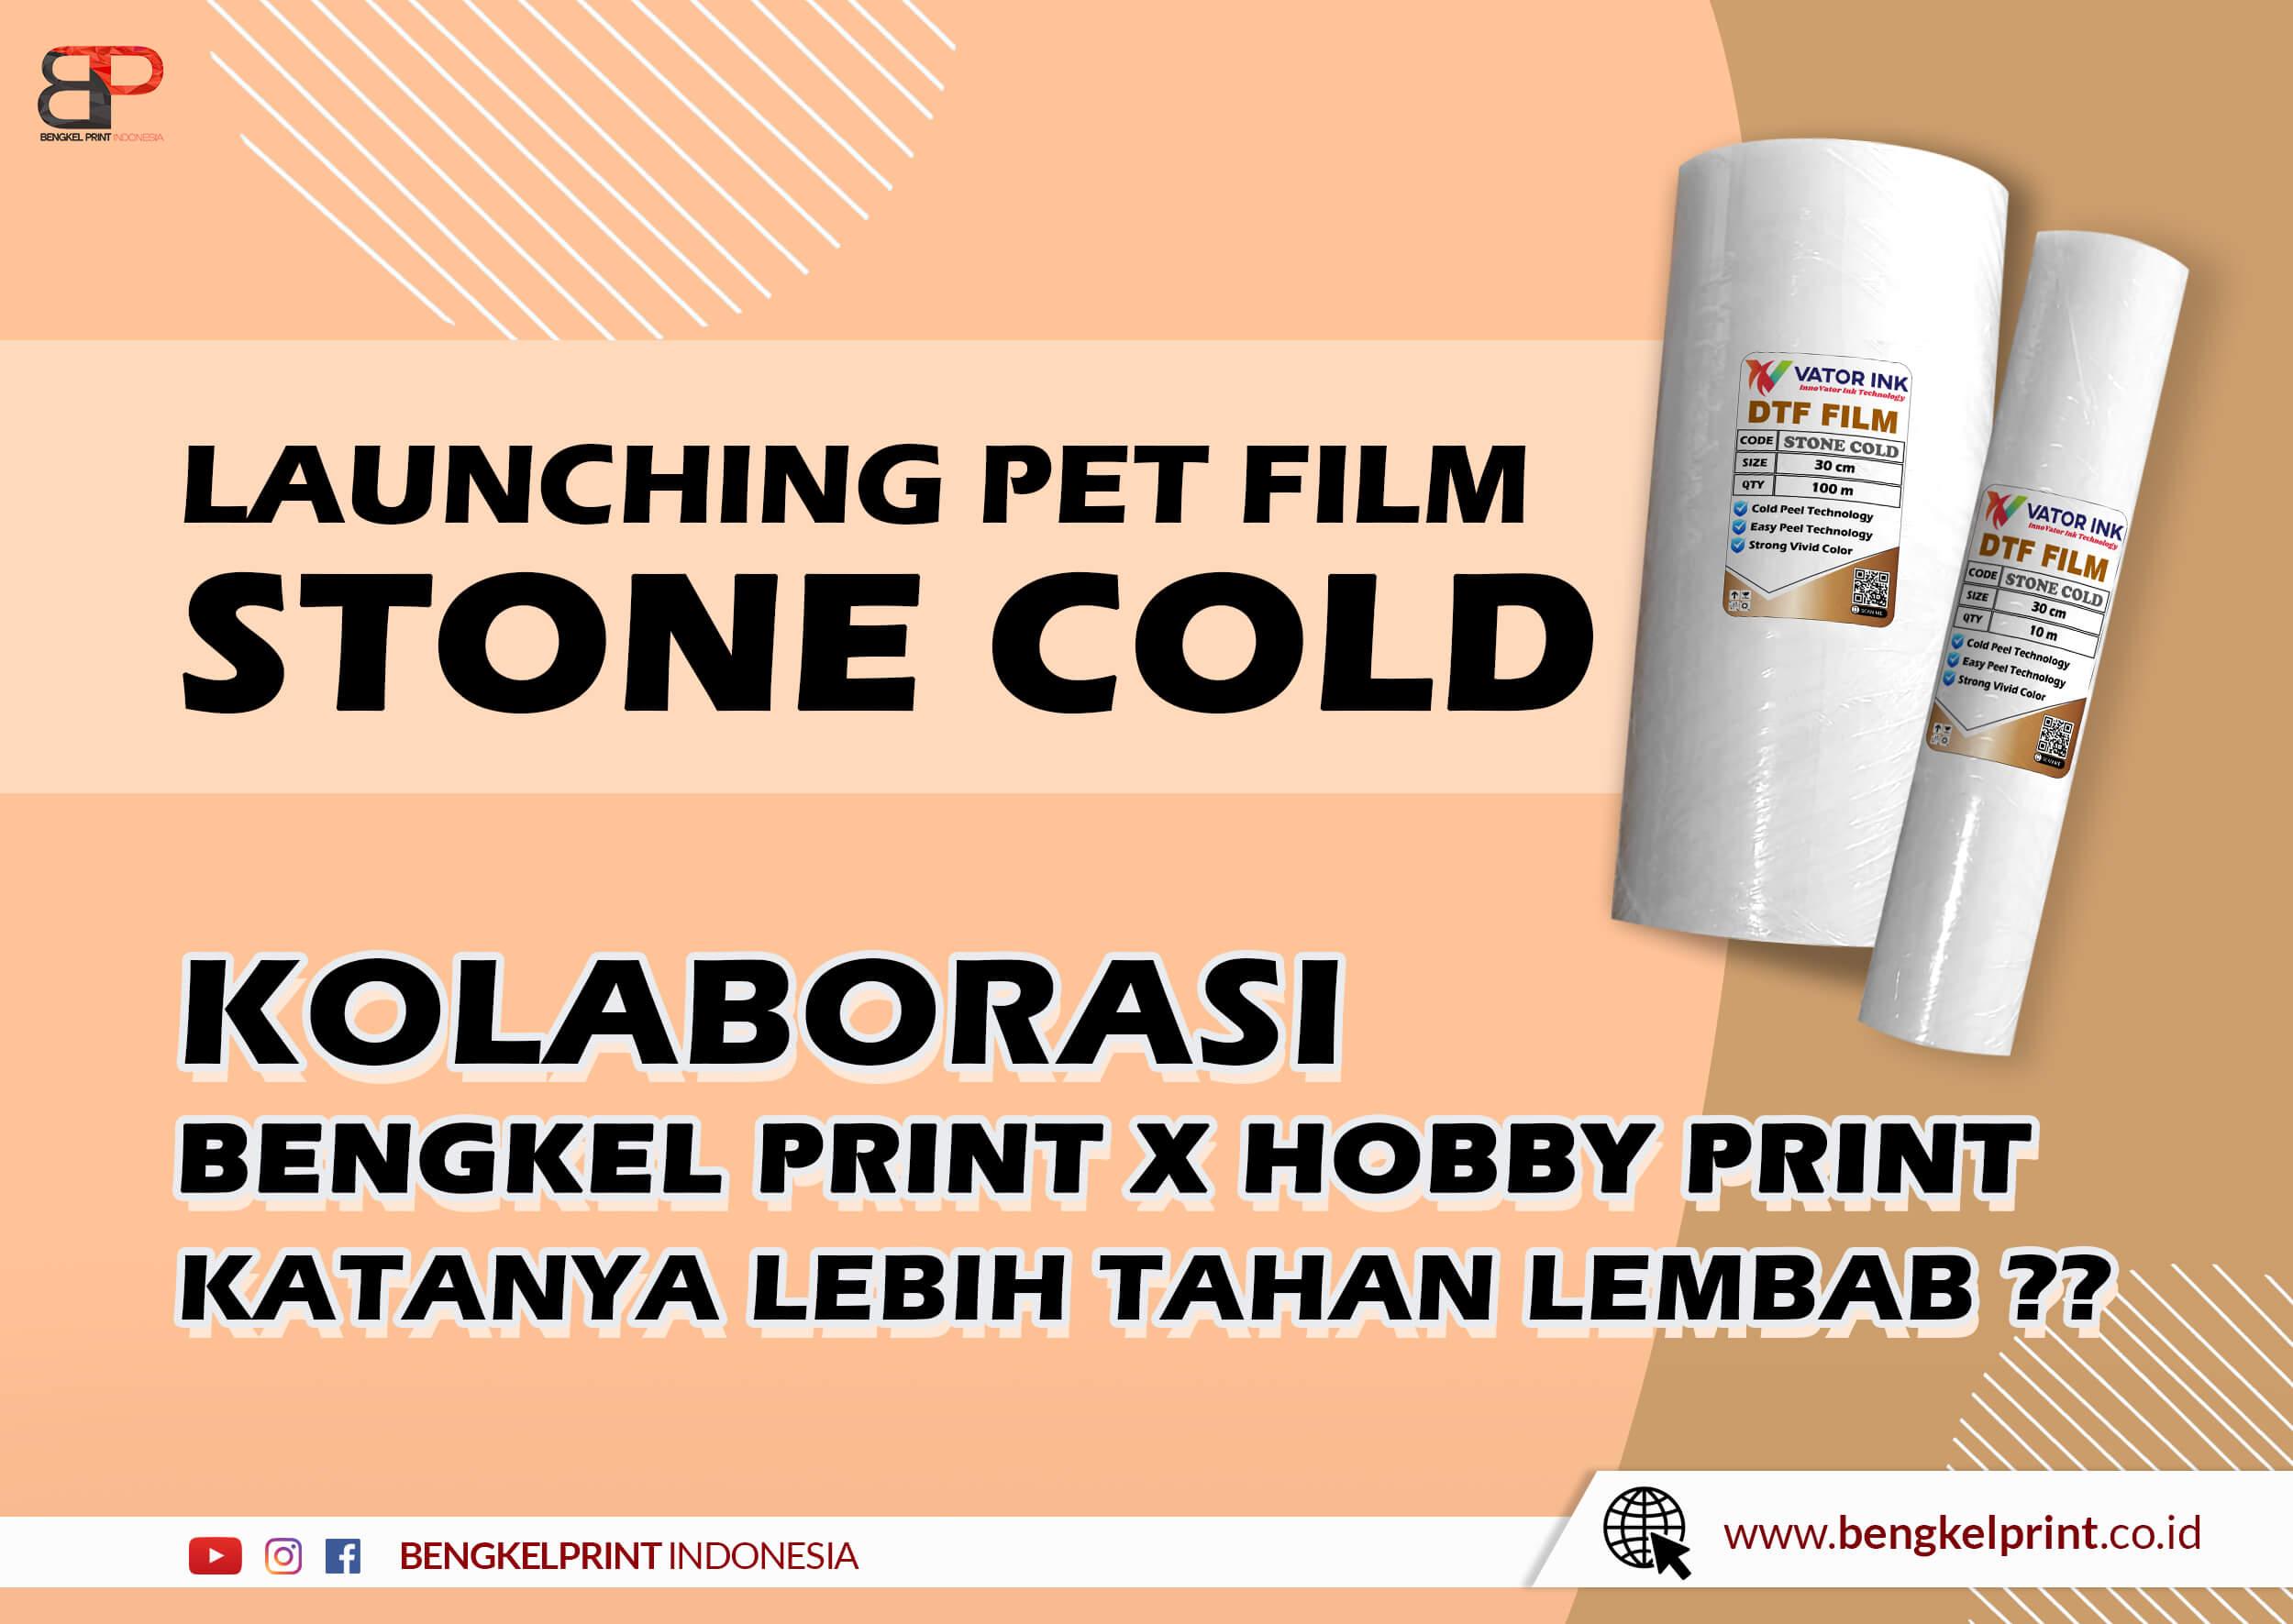 jual kertas film dtf stone cold 2021